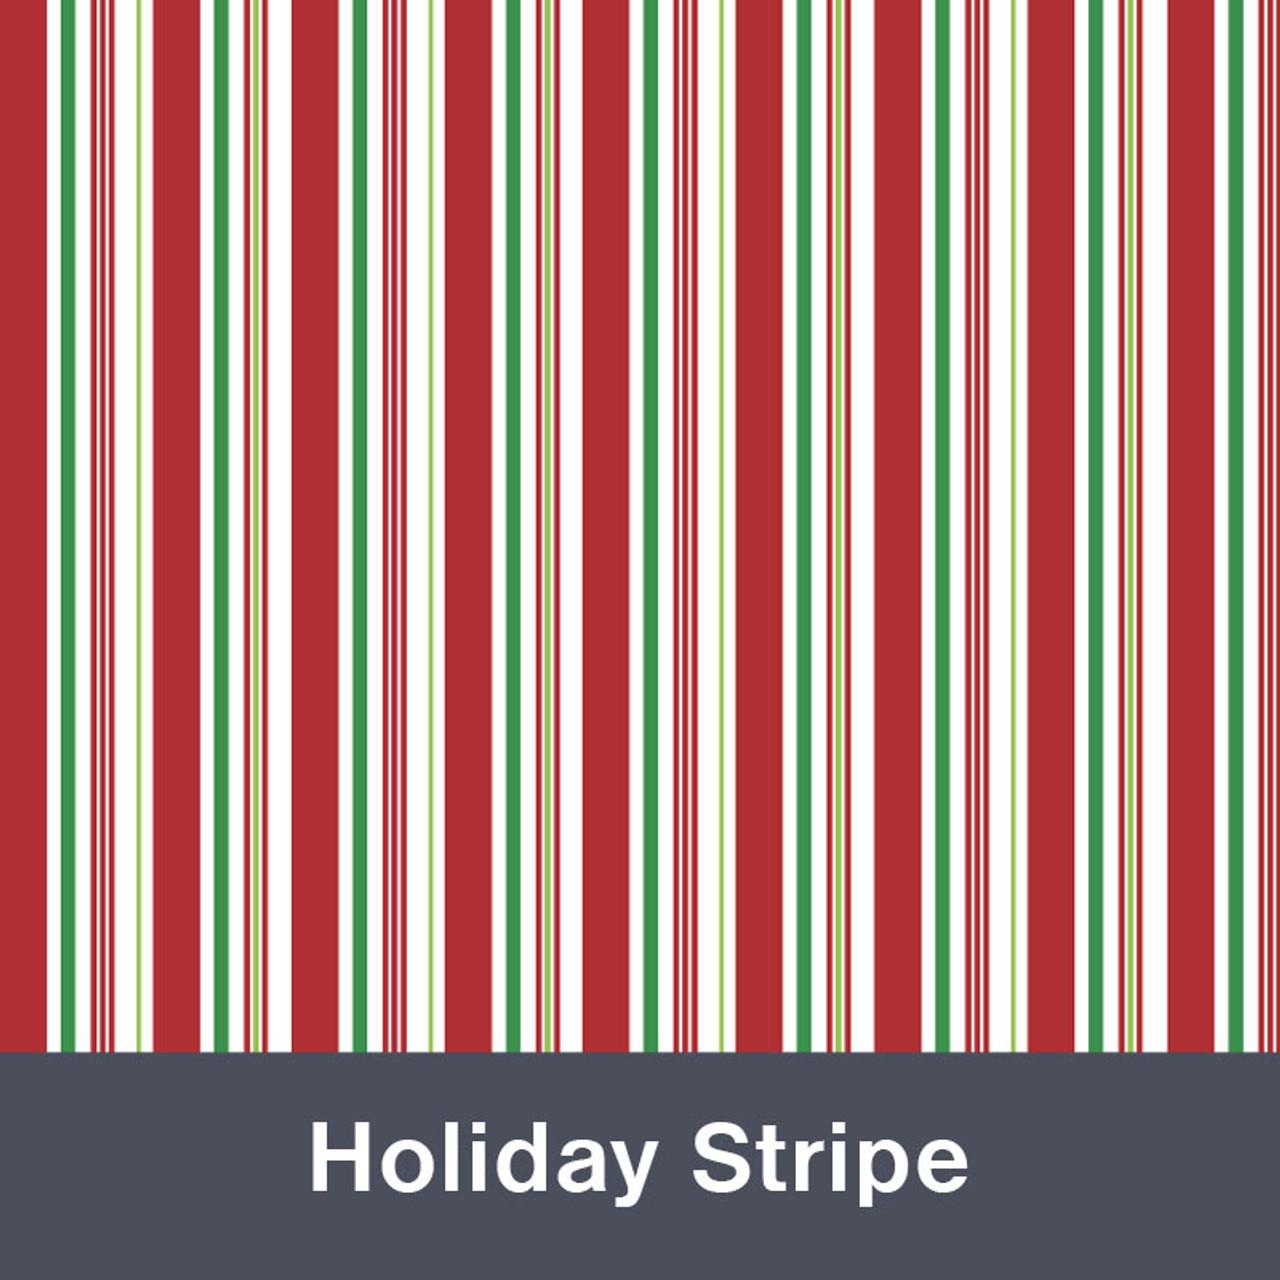 Holiday Stripe